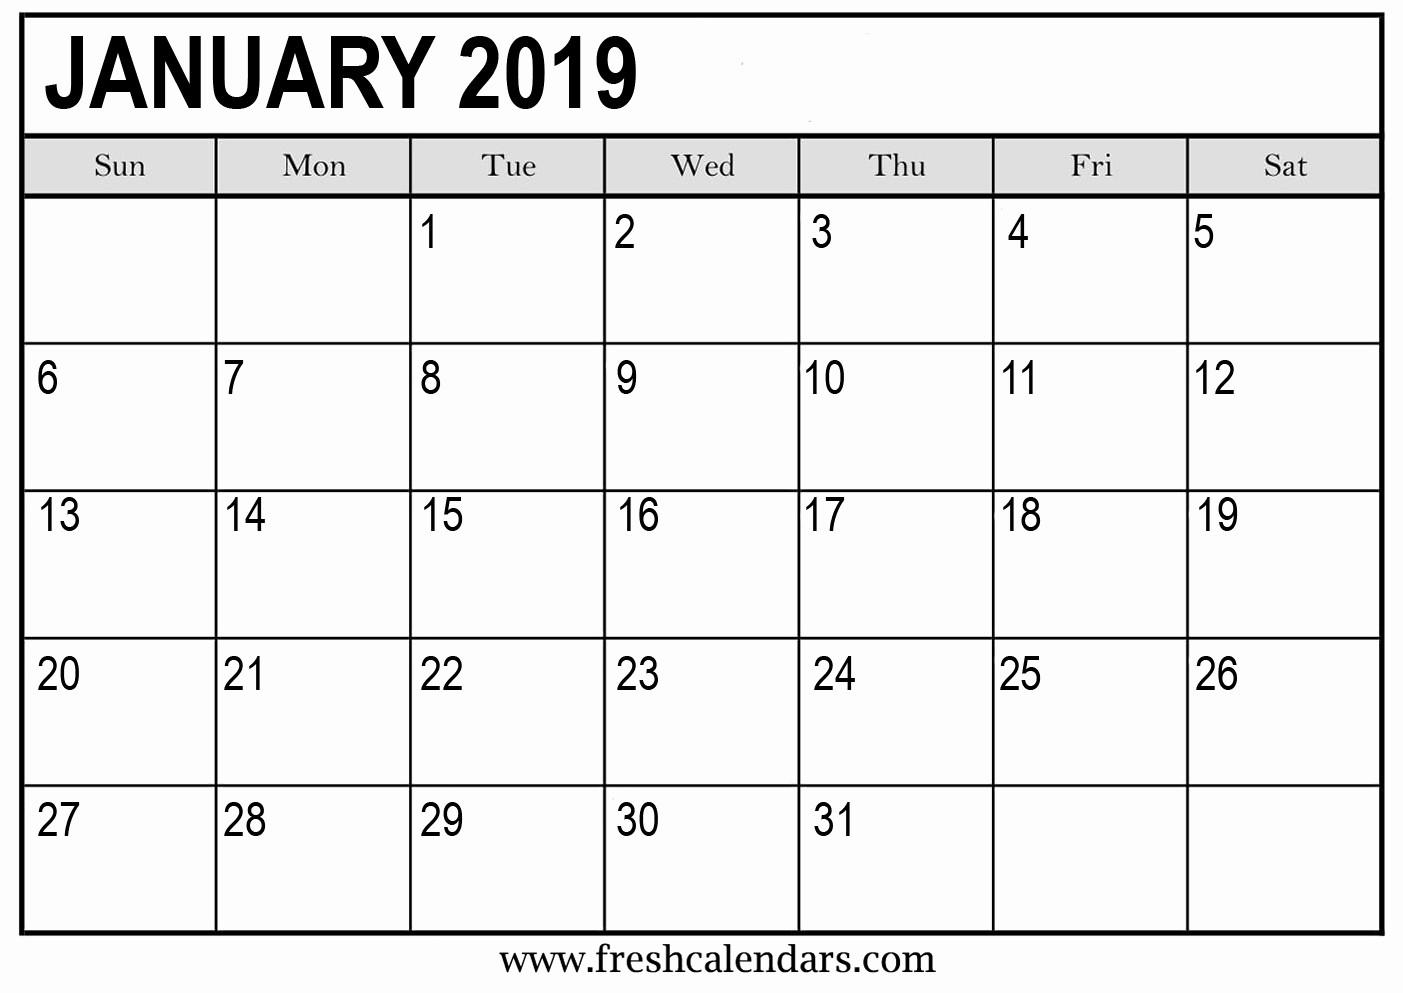 Free Printable Weekly Calendar 2019 Lovely Printable January 2019 Calendar Fresh Calendars